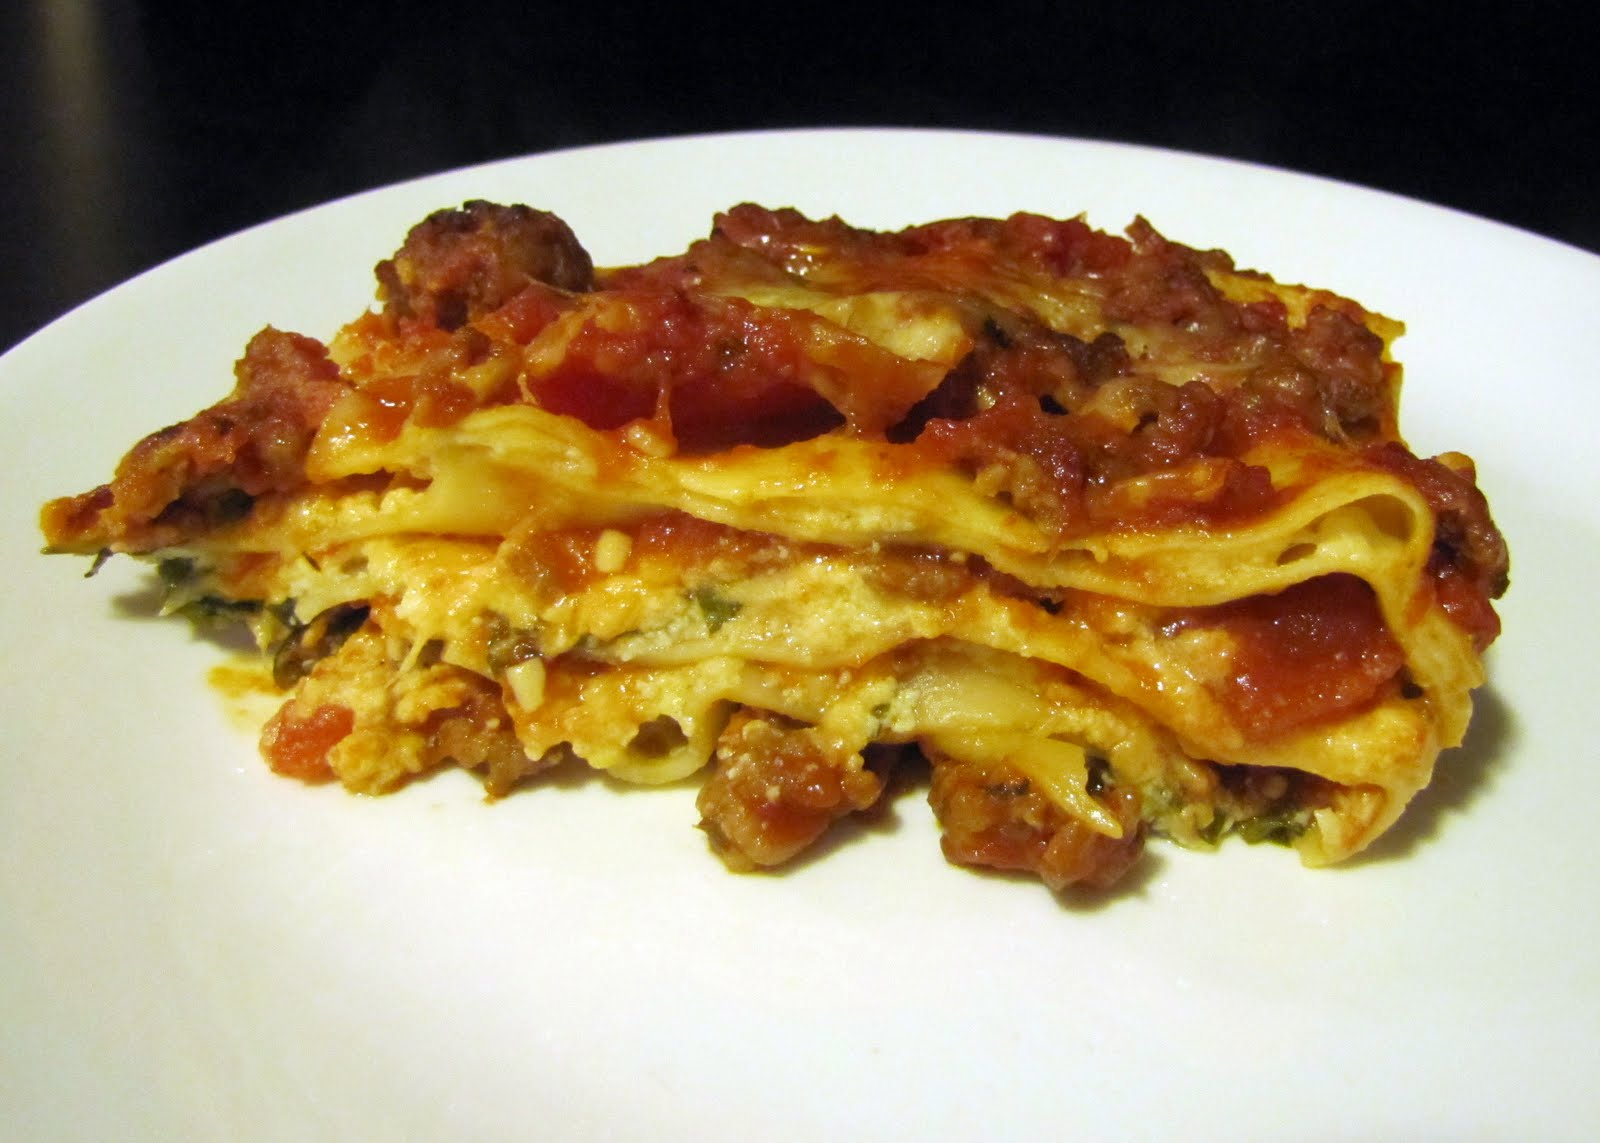 ... Sausage, Cheese and Basil Lasagna , this time with hot Italian sausage